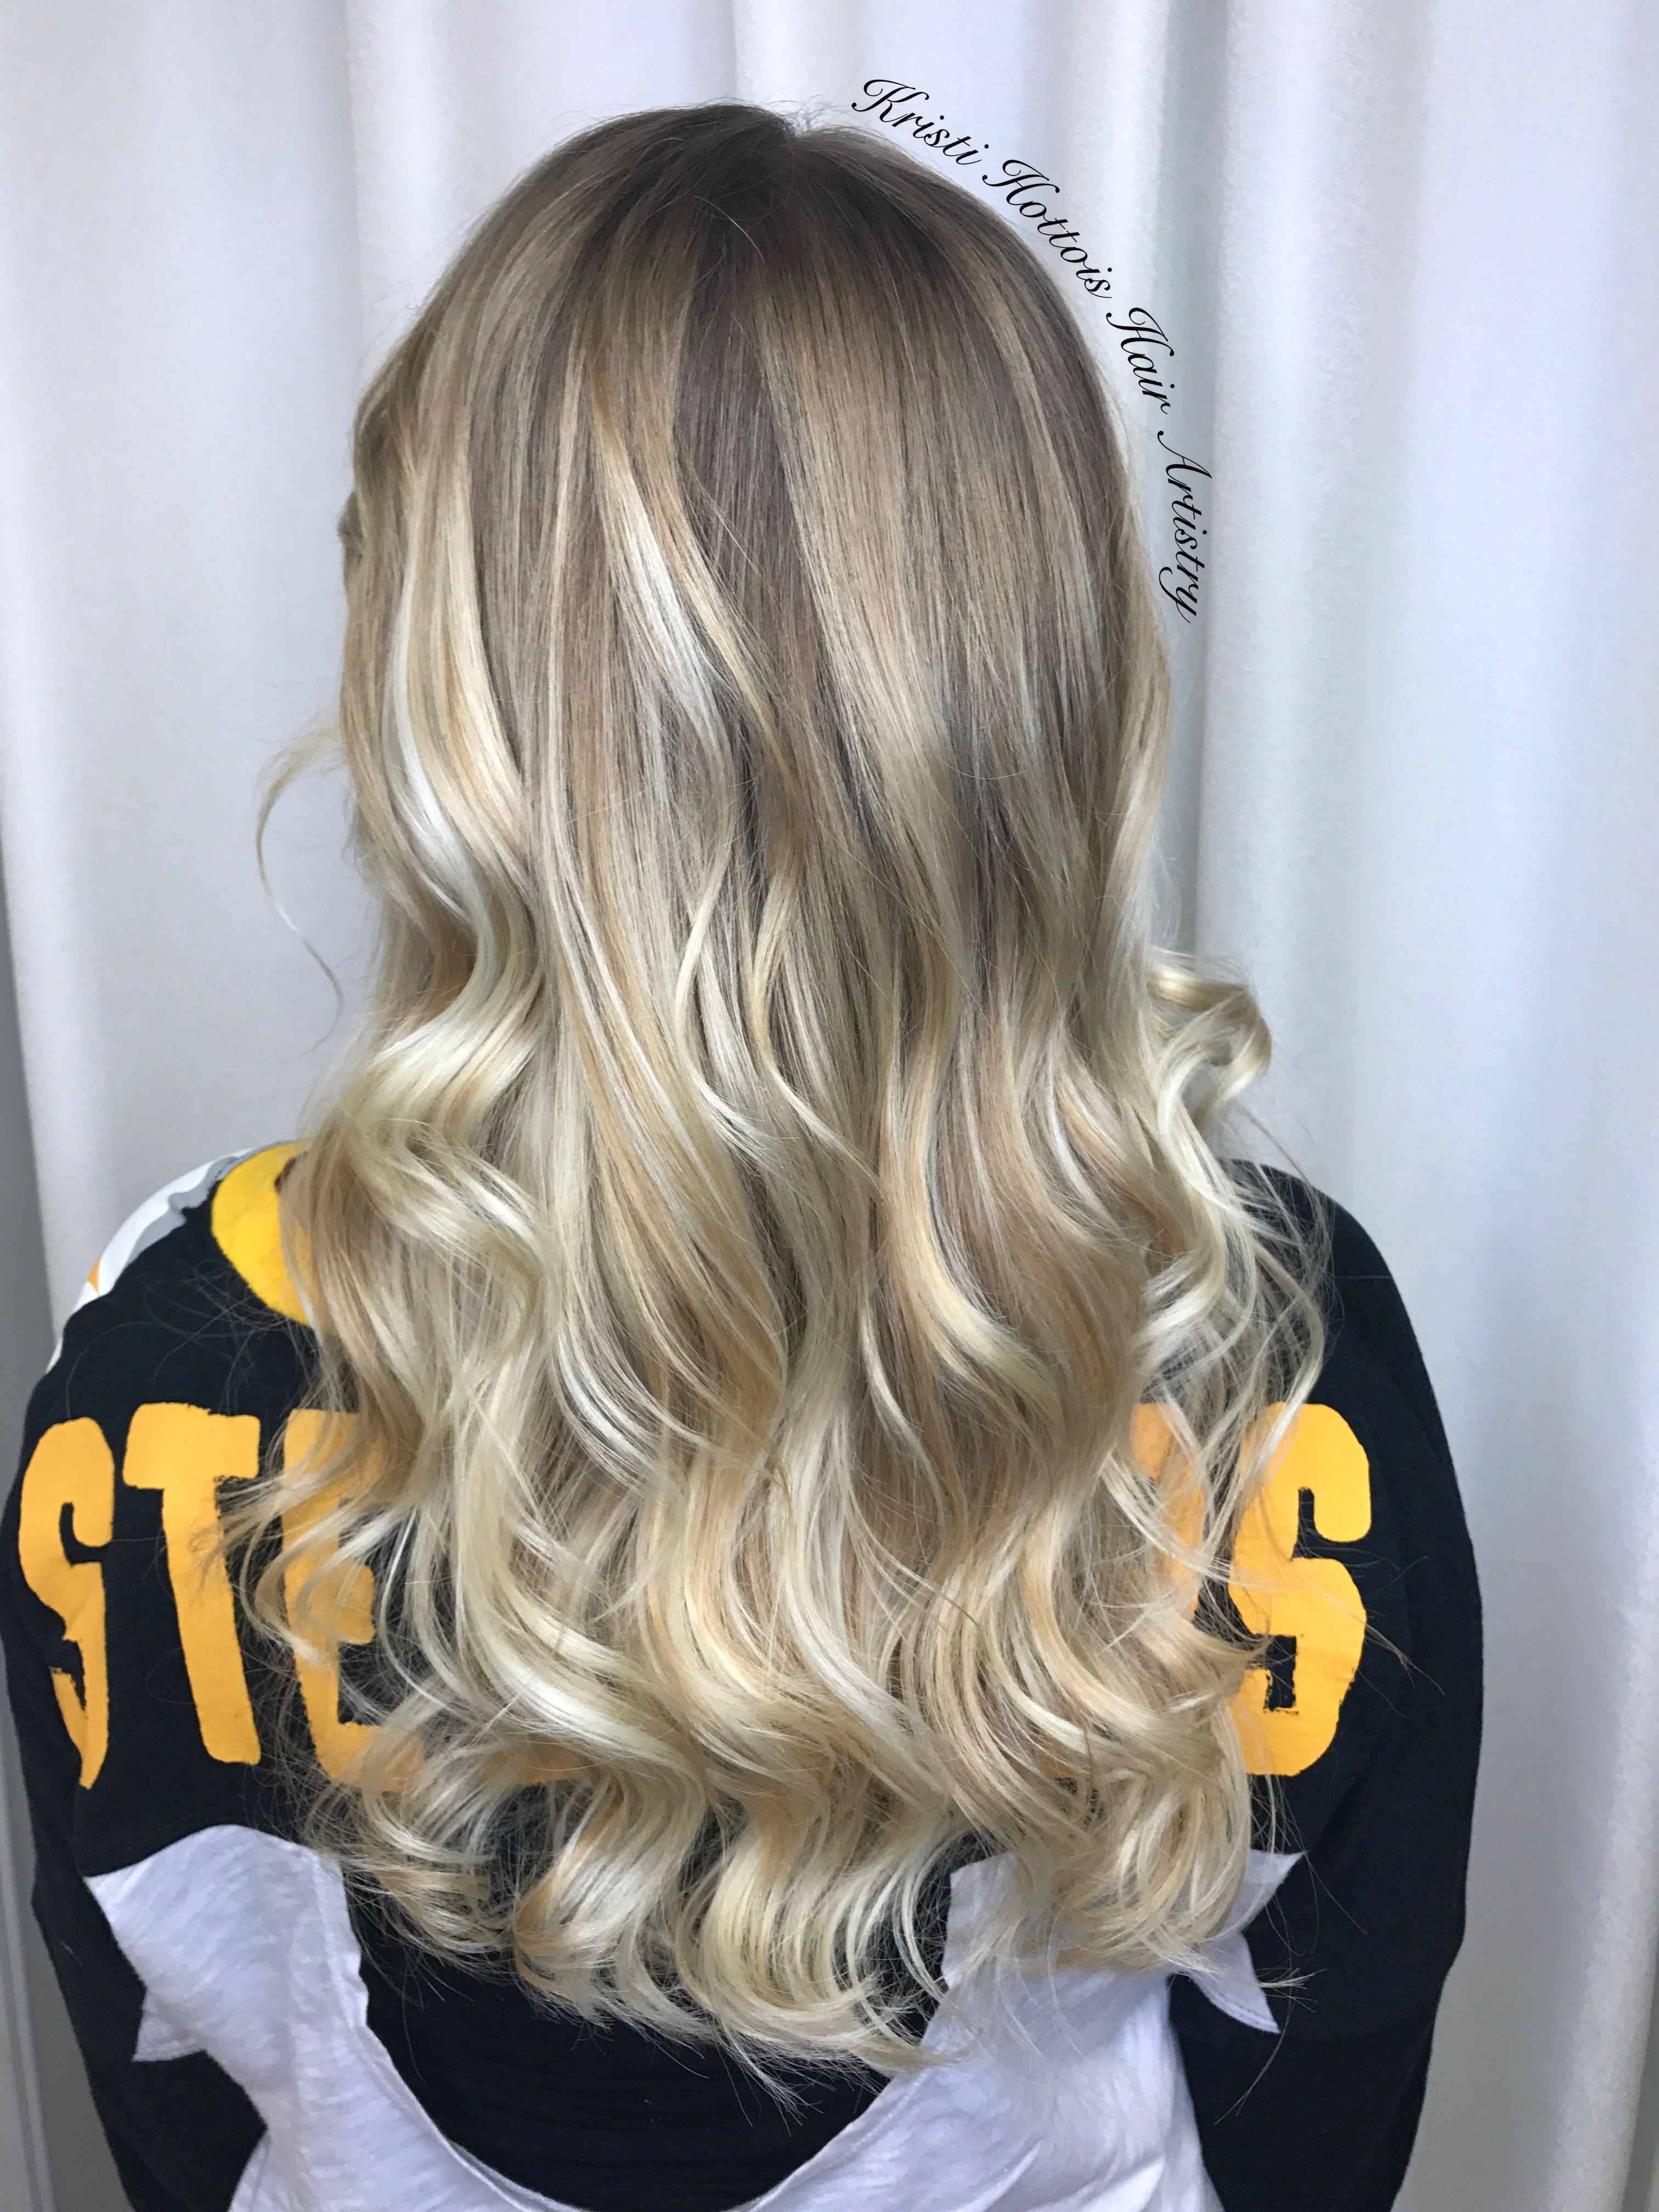 Ballayage Blond destiné winter blonde balayage somber highlights using my favorite oligo